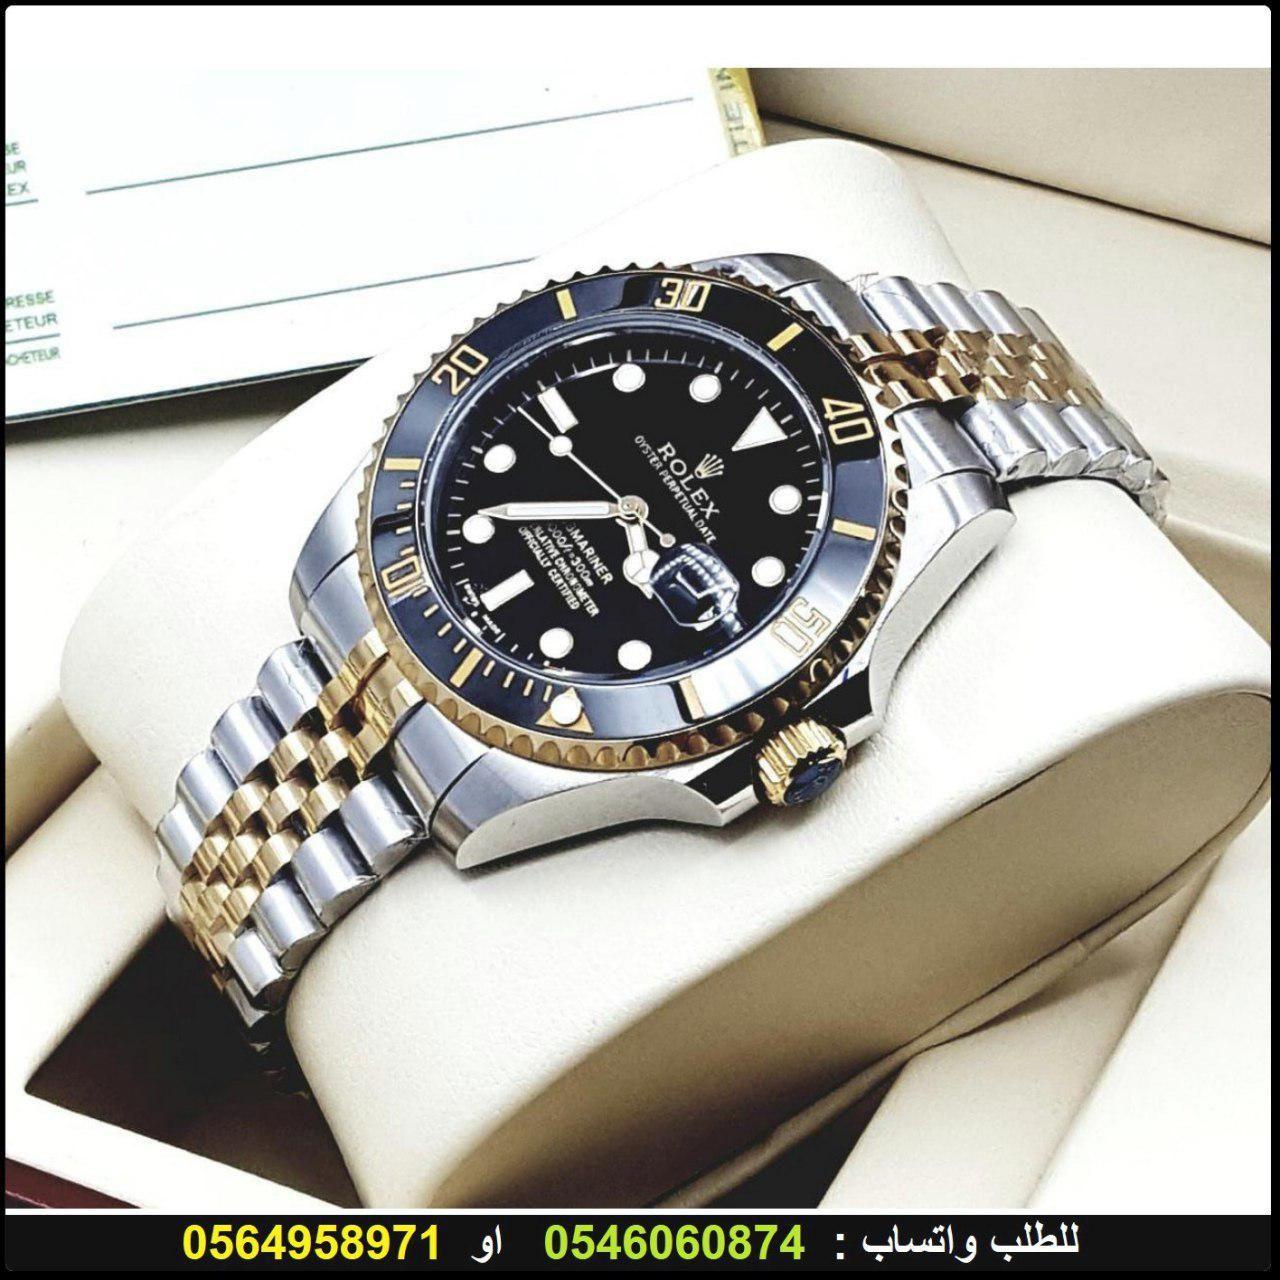 ساعات رولكس سمرينا رجاليه Rolex درجه اولى مع علبه و كرت الماركه هدايا هنوف Rolex Watches Rolex Accessories